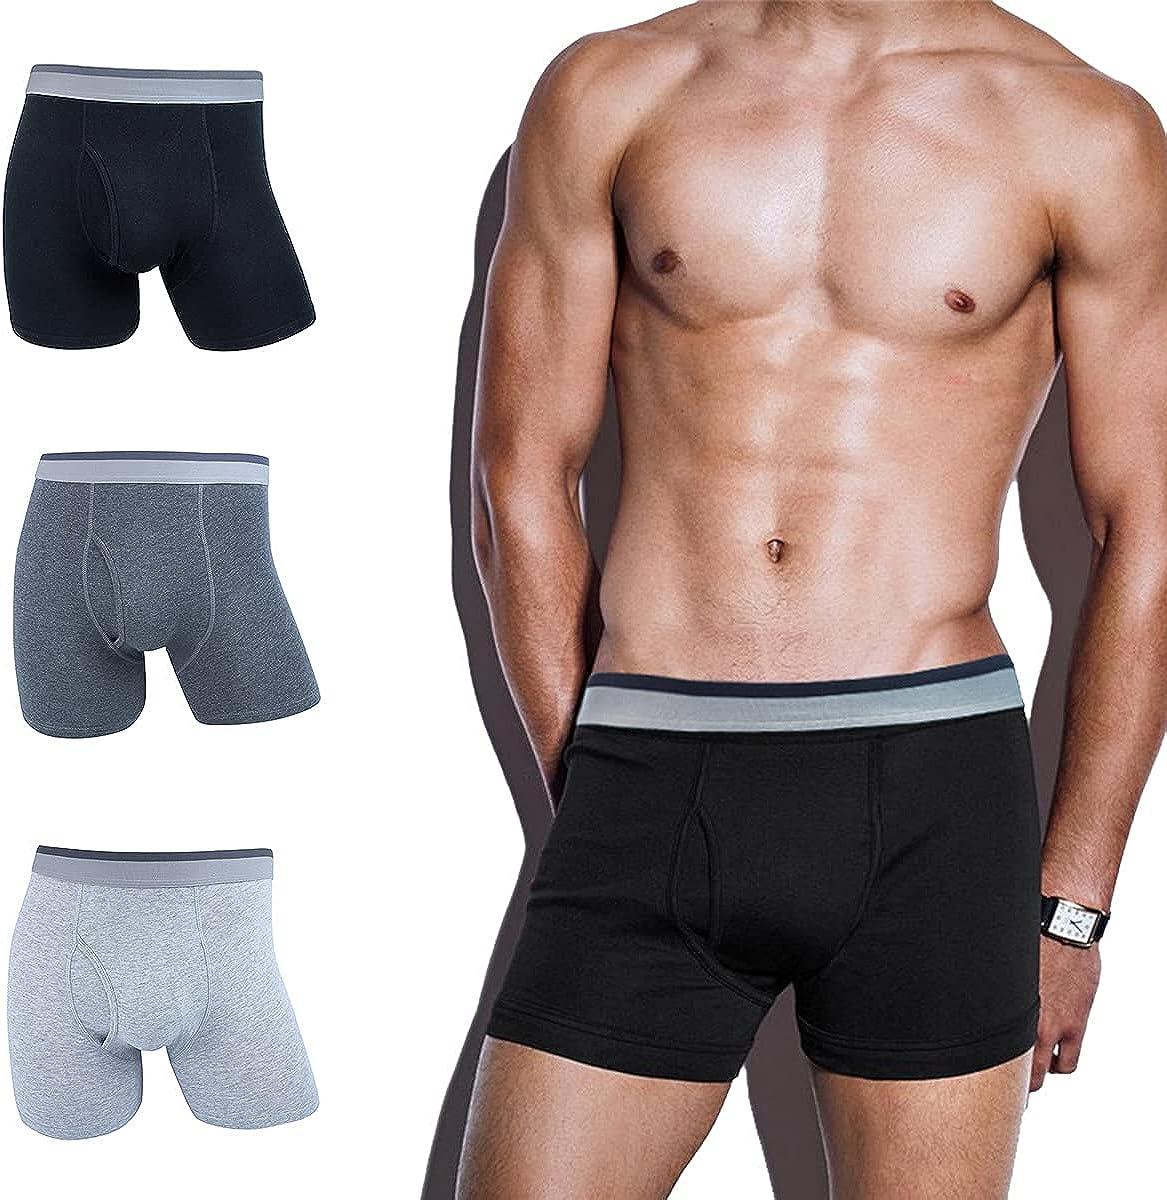 Archneat Boxer Briefs for Men Boston Mall Pack cheap with Men's Cotton Underwear F